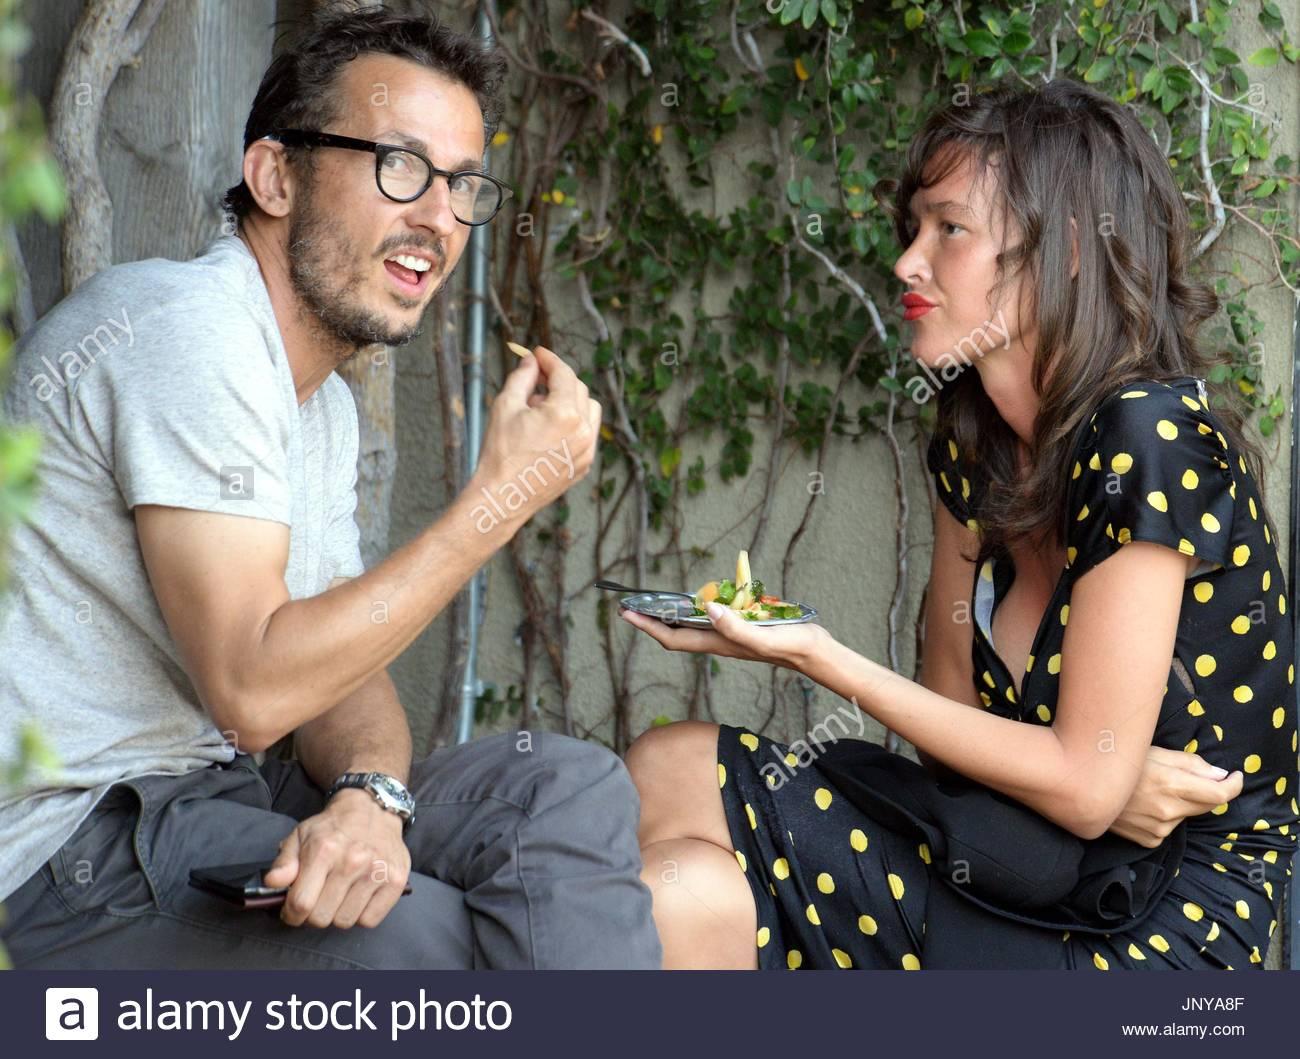 Who is tao ruspoli dating